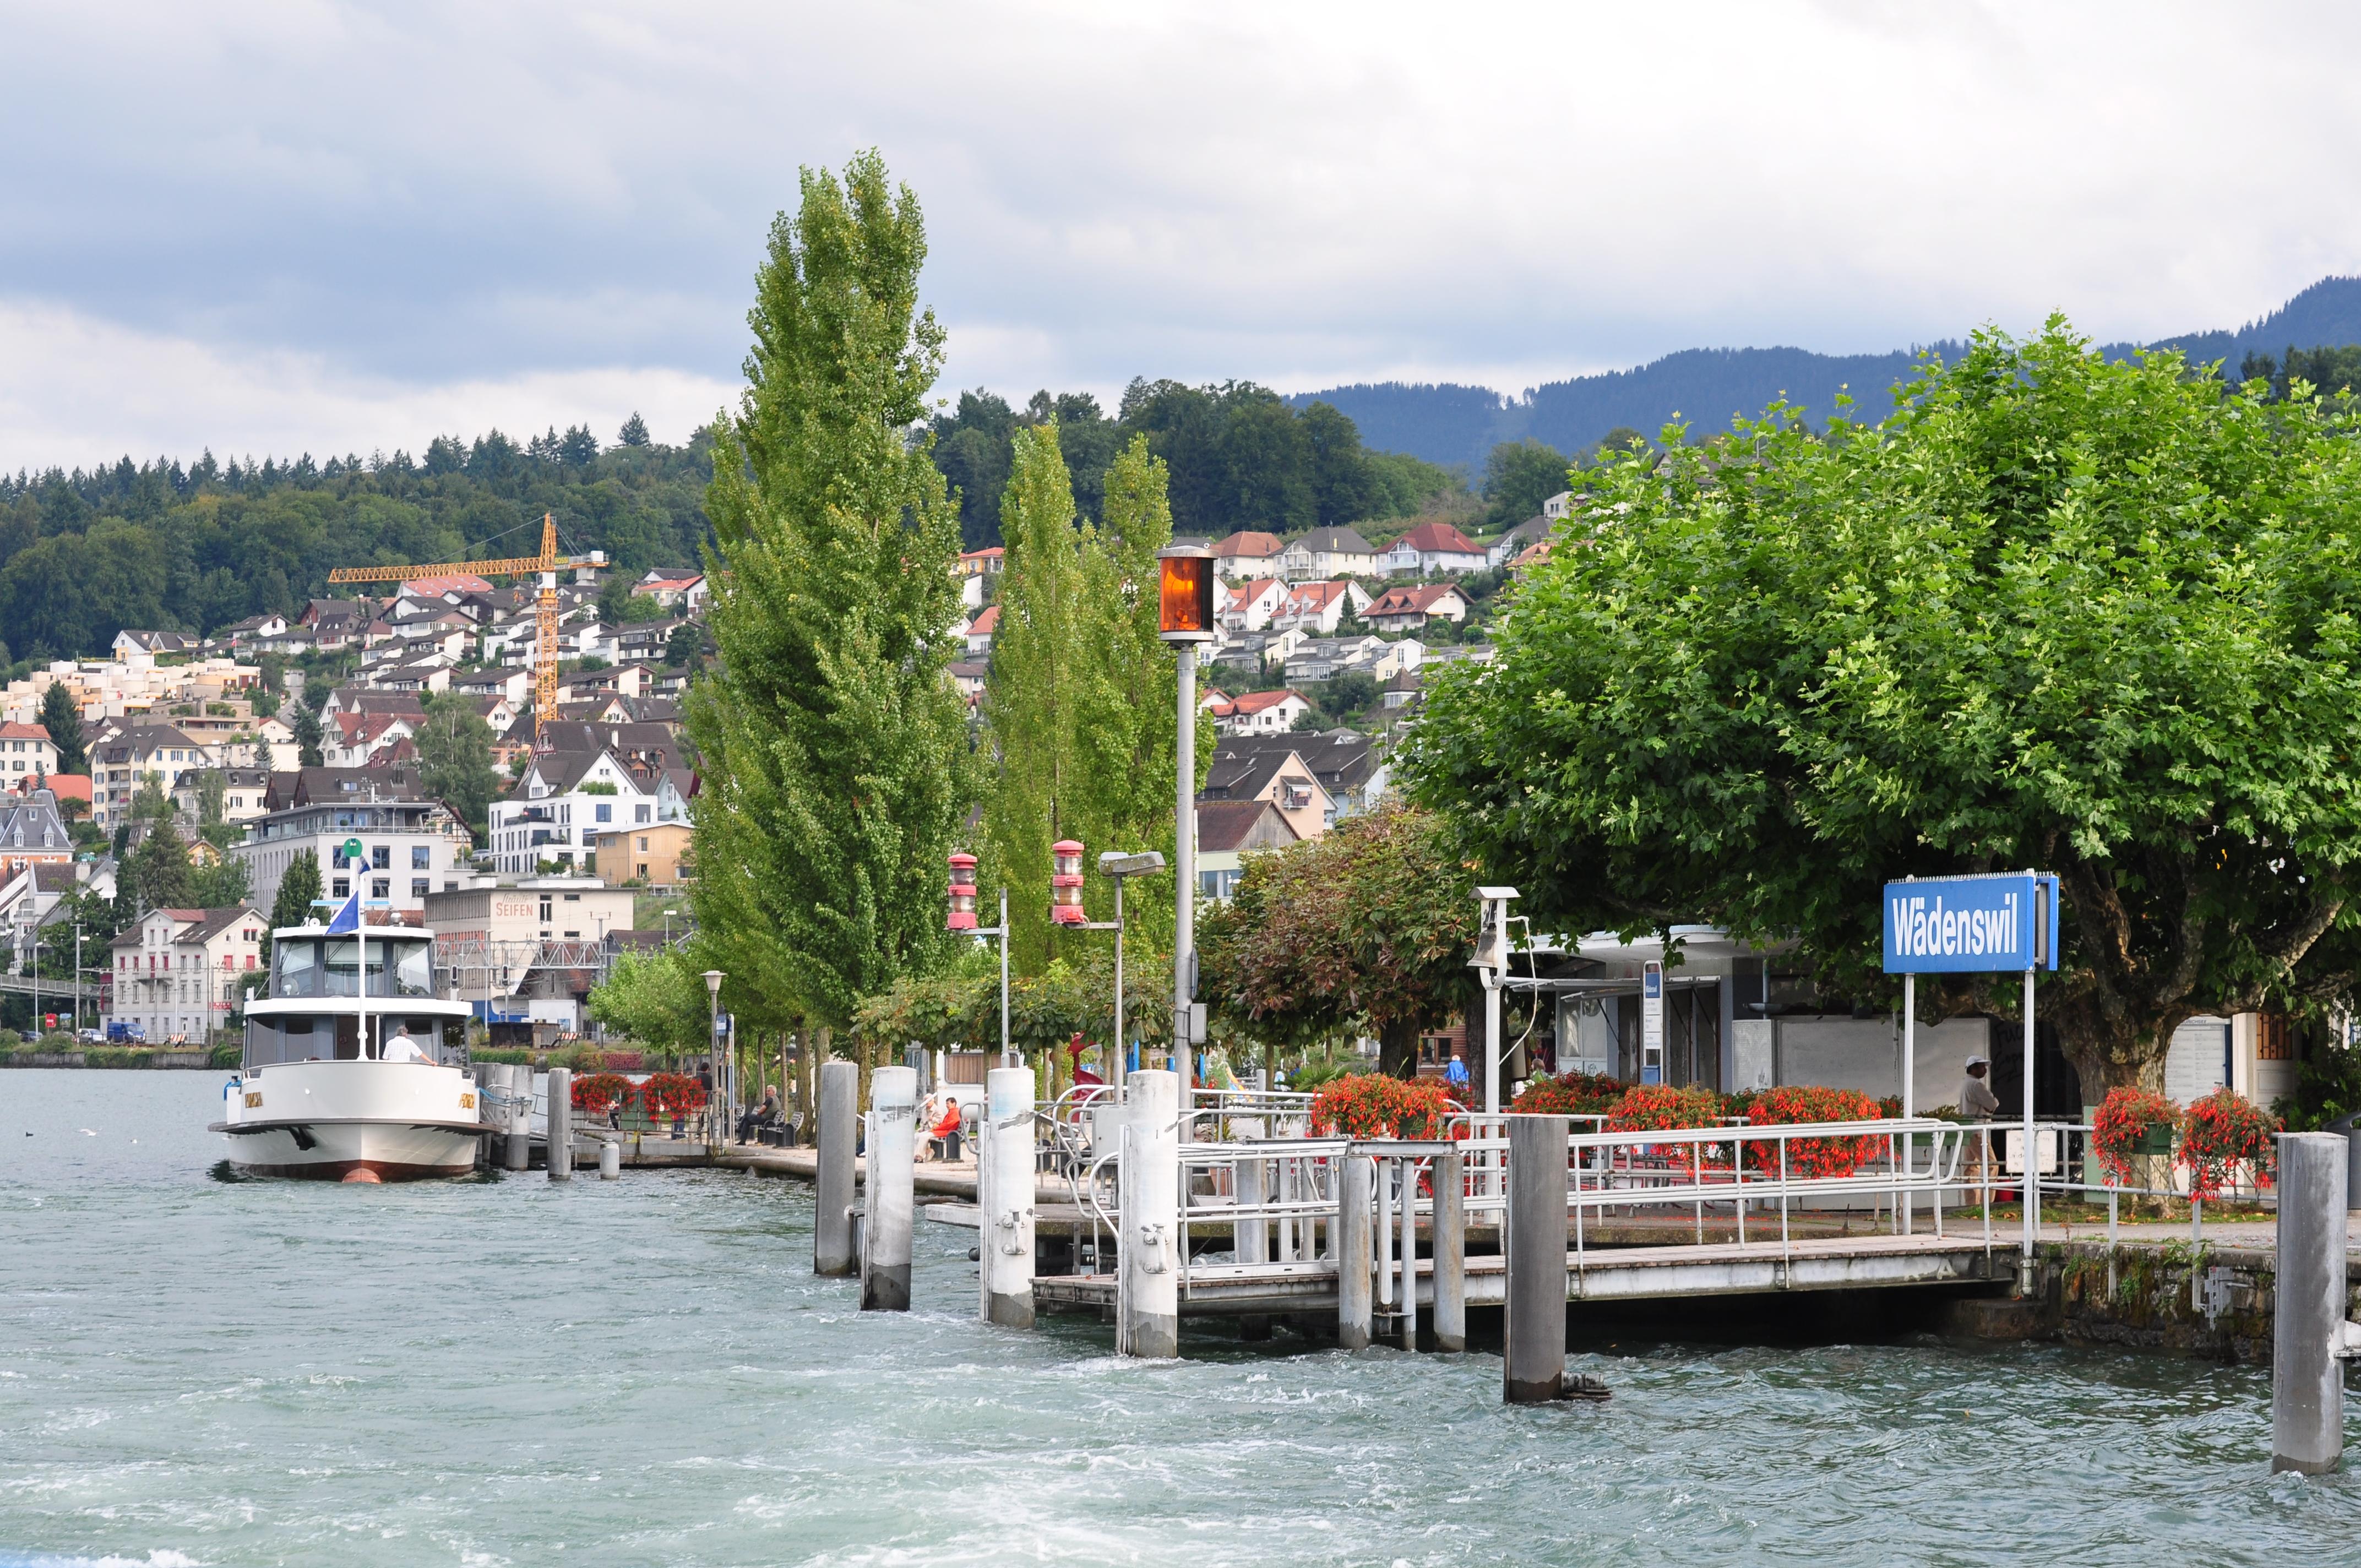 File:Zürichsee - Wädenswil IMG 2654.jpg - Wikimedia Commons